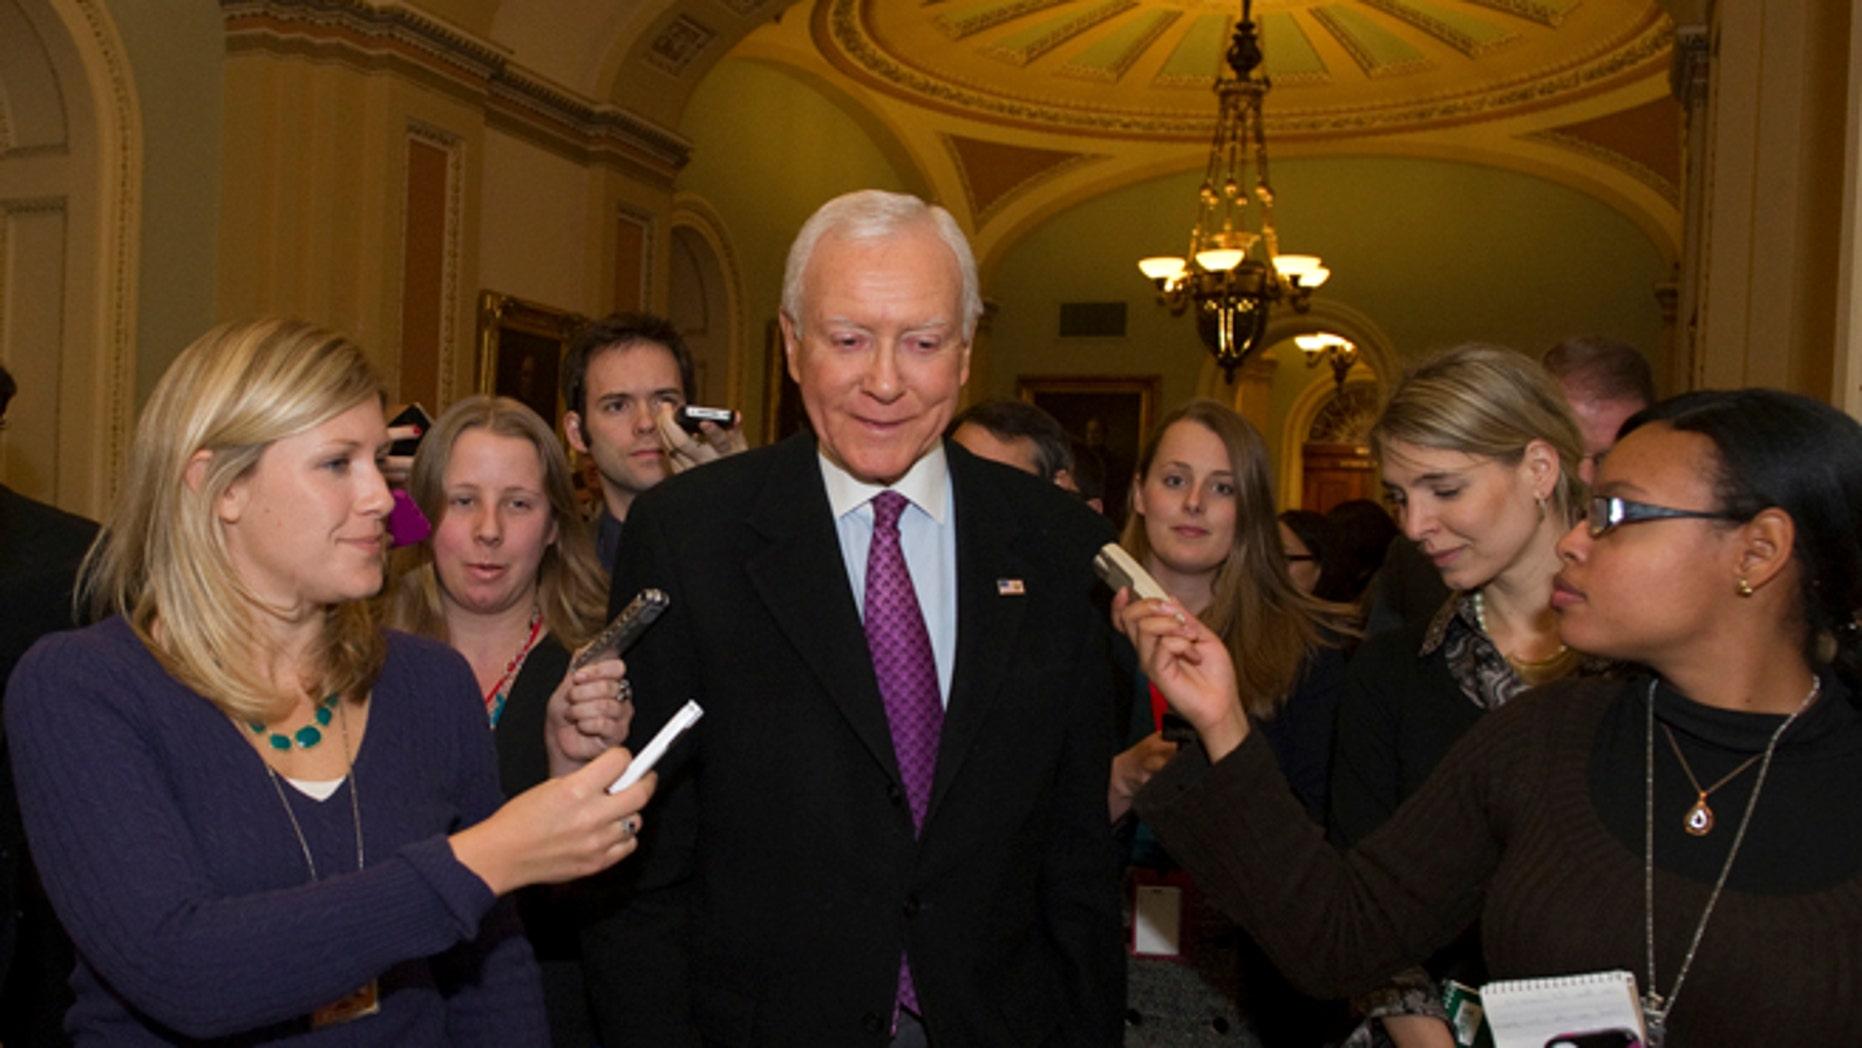 FILE: Dec. 31, 2012: Sen. Orrin Hatch, R-Utah, in the hall of the U.S. Capitol, in Washington, D.C.